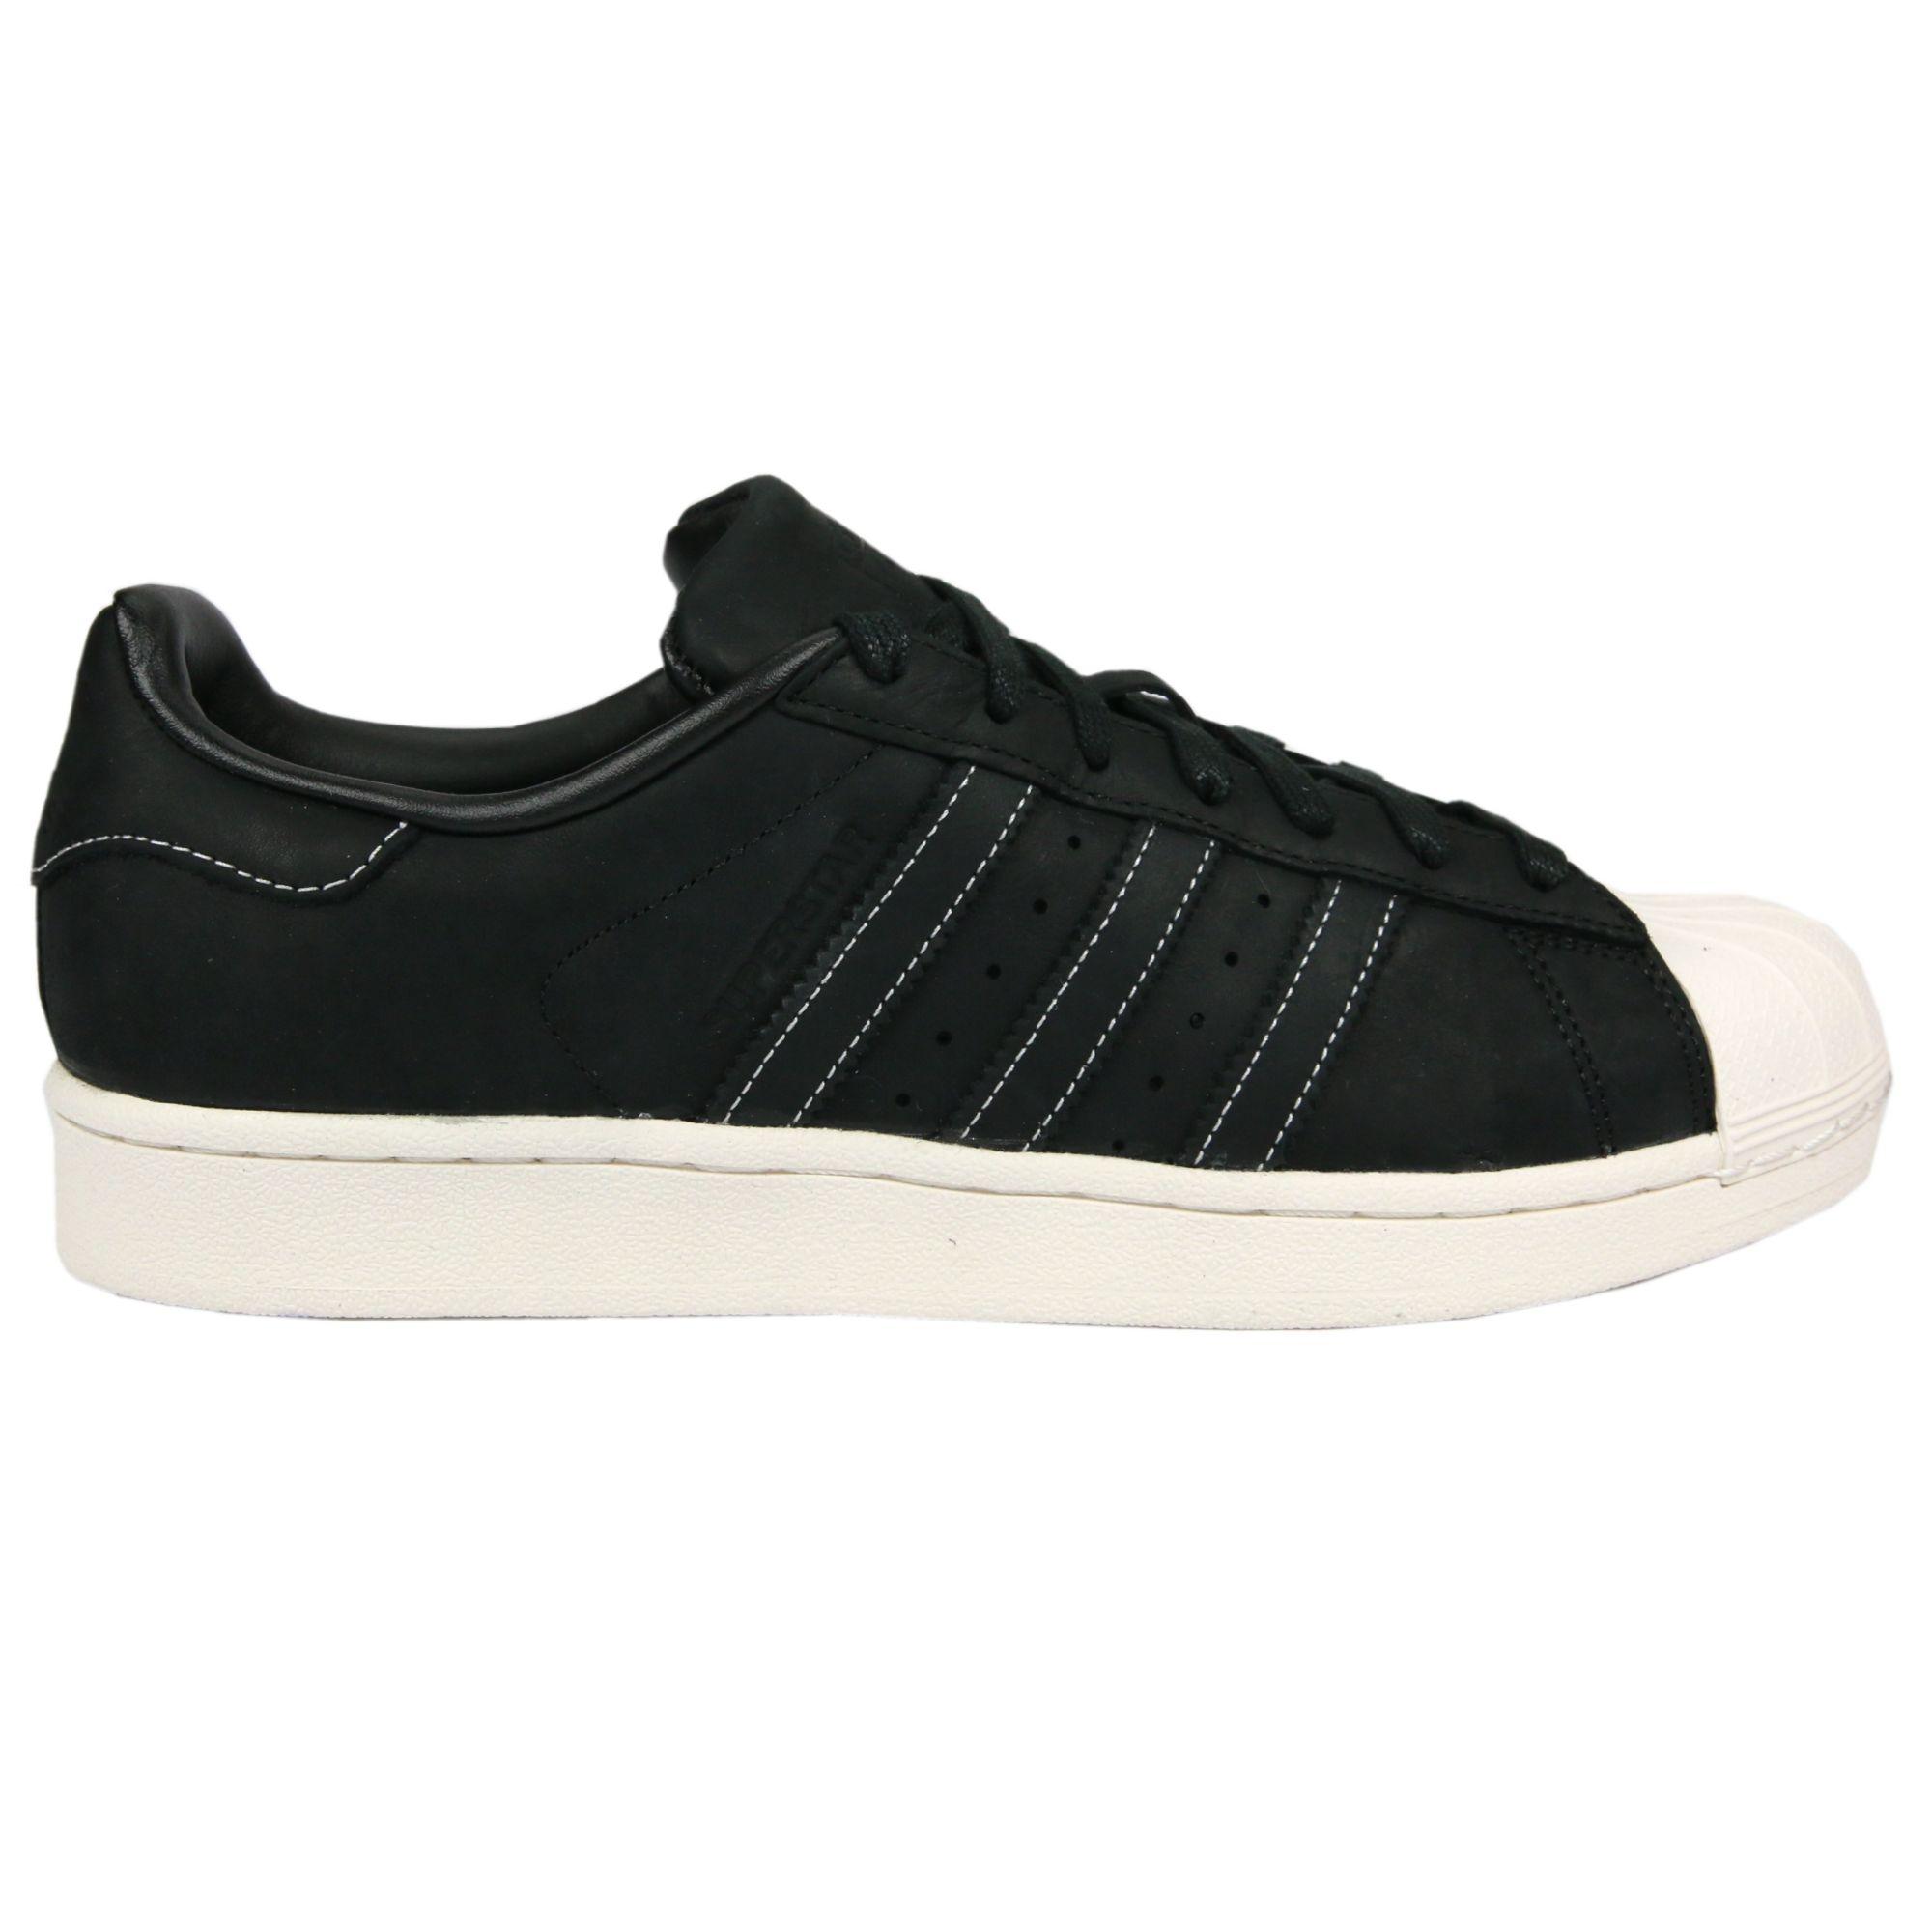 Adidas Originals Superstar RT Schuhe Turnschuhe Sneaker Unisex Schwarz S79470